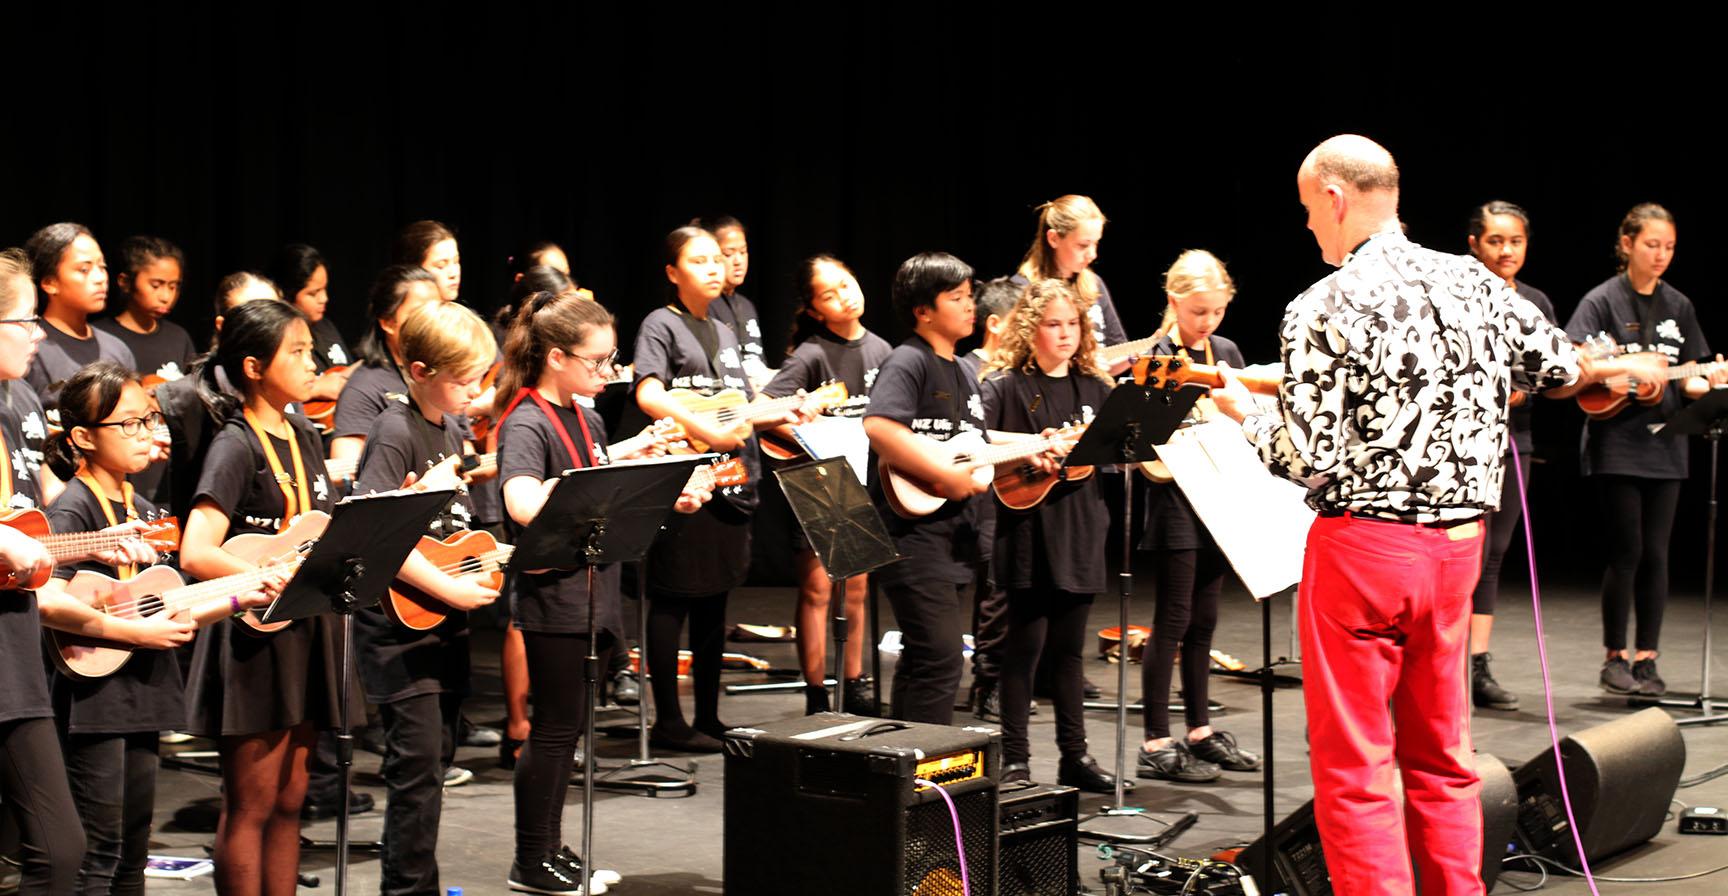 NZ_Ukulele_Squads_James_Hill_rehearsal_20171124_0336.JPG